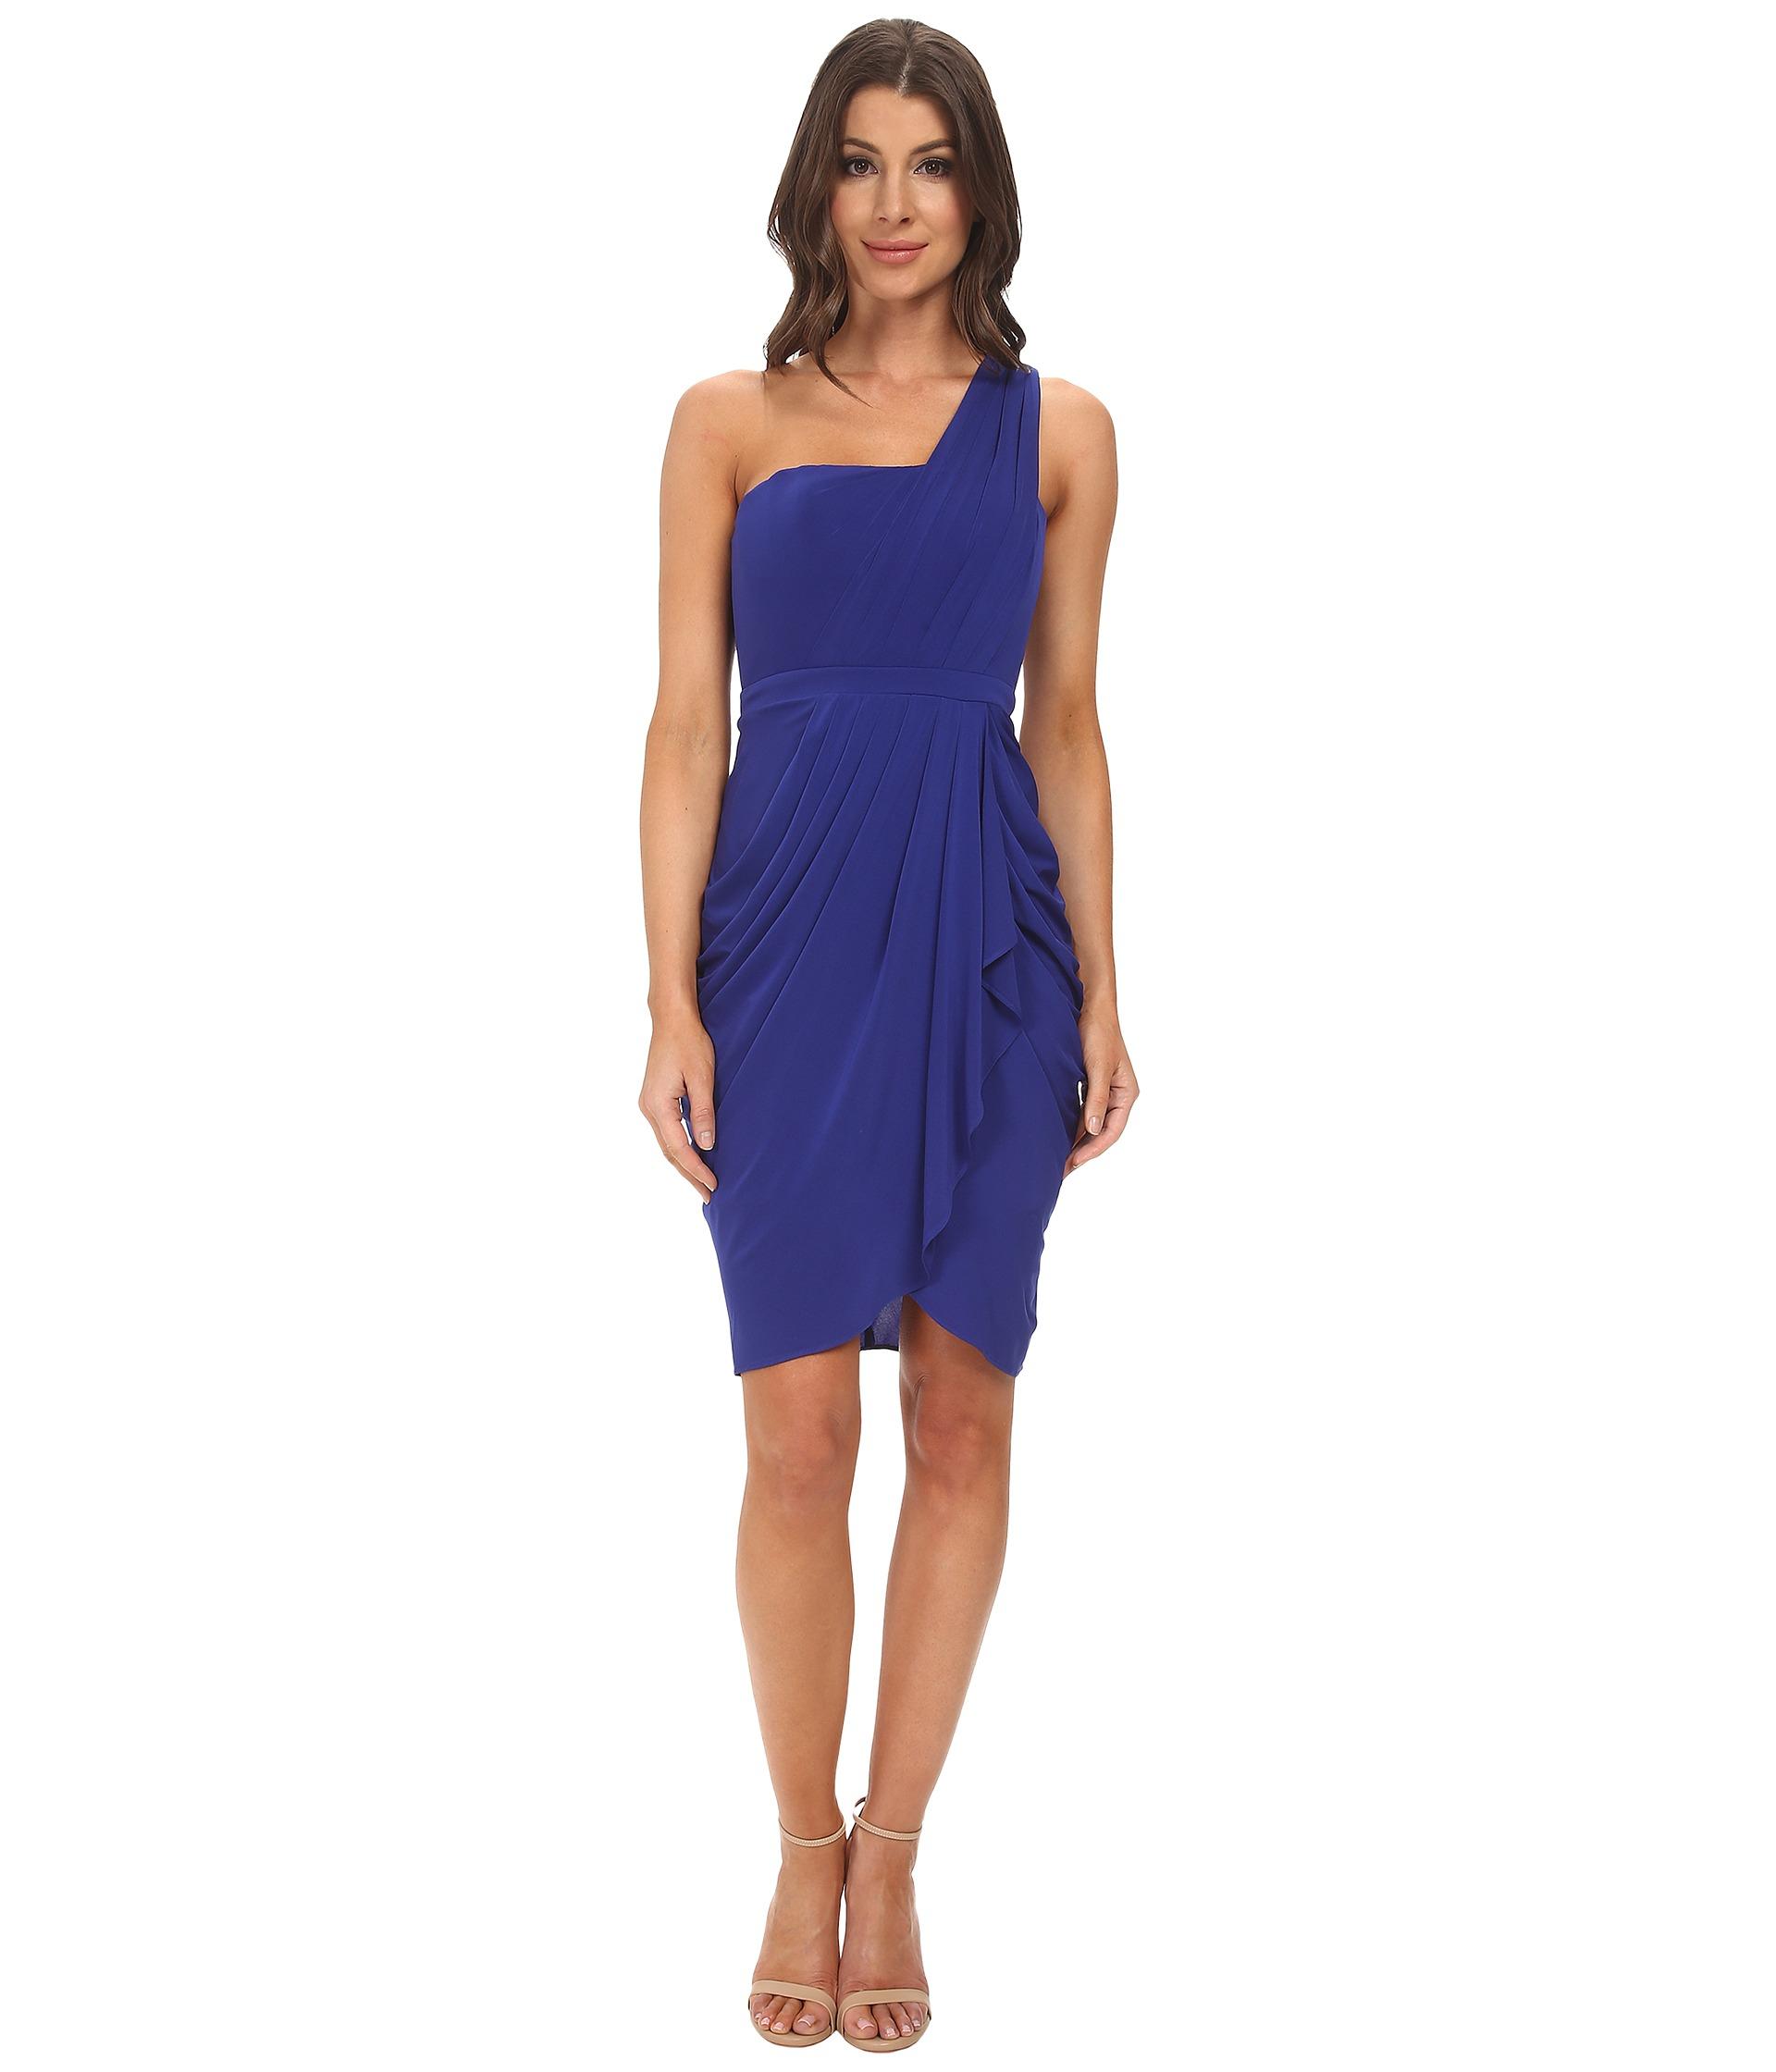 4593d19e40d8 BCBGMAXAZRIA Julieta One Shoulder Dress in Blue - Lyst